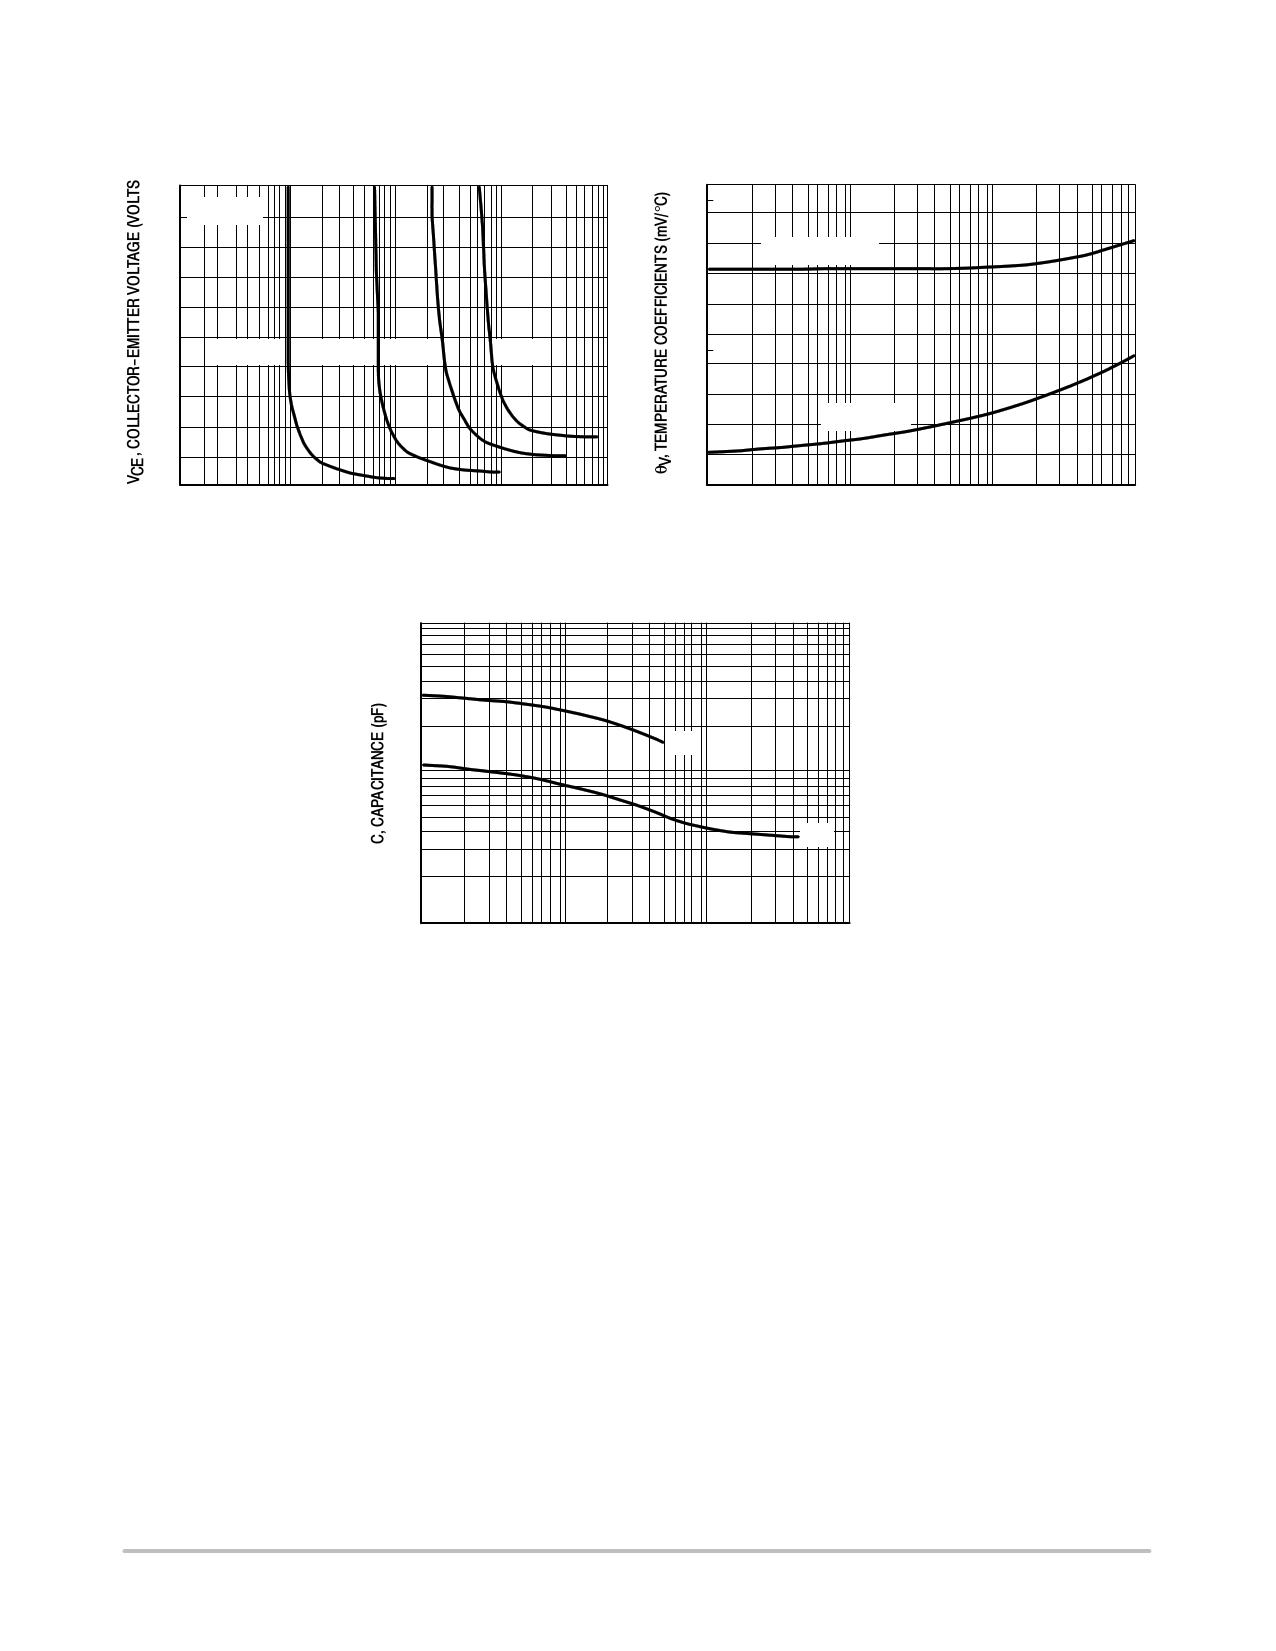 SBC817-16L pdf, 반도체, 판매, 대치품